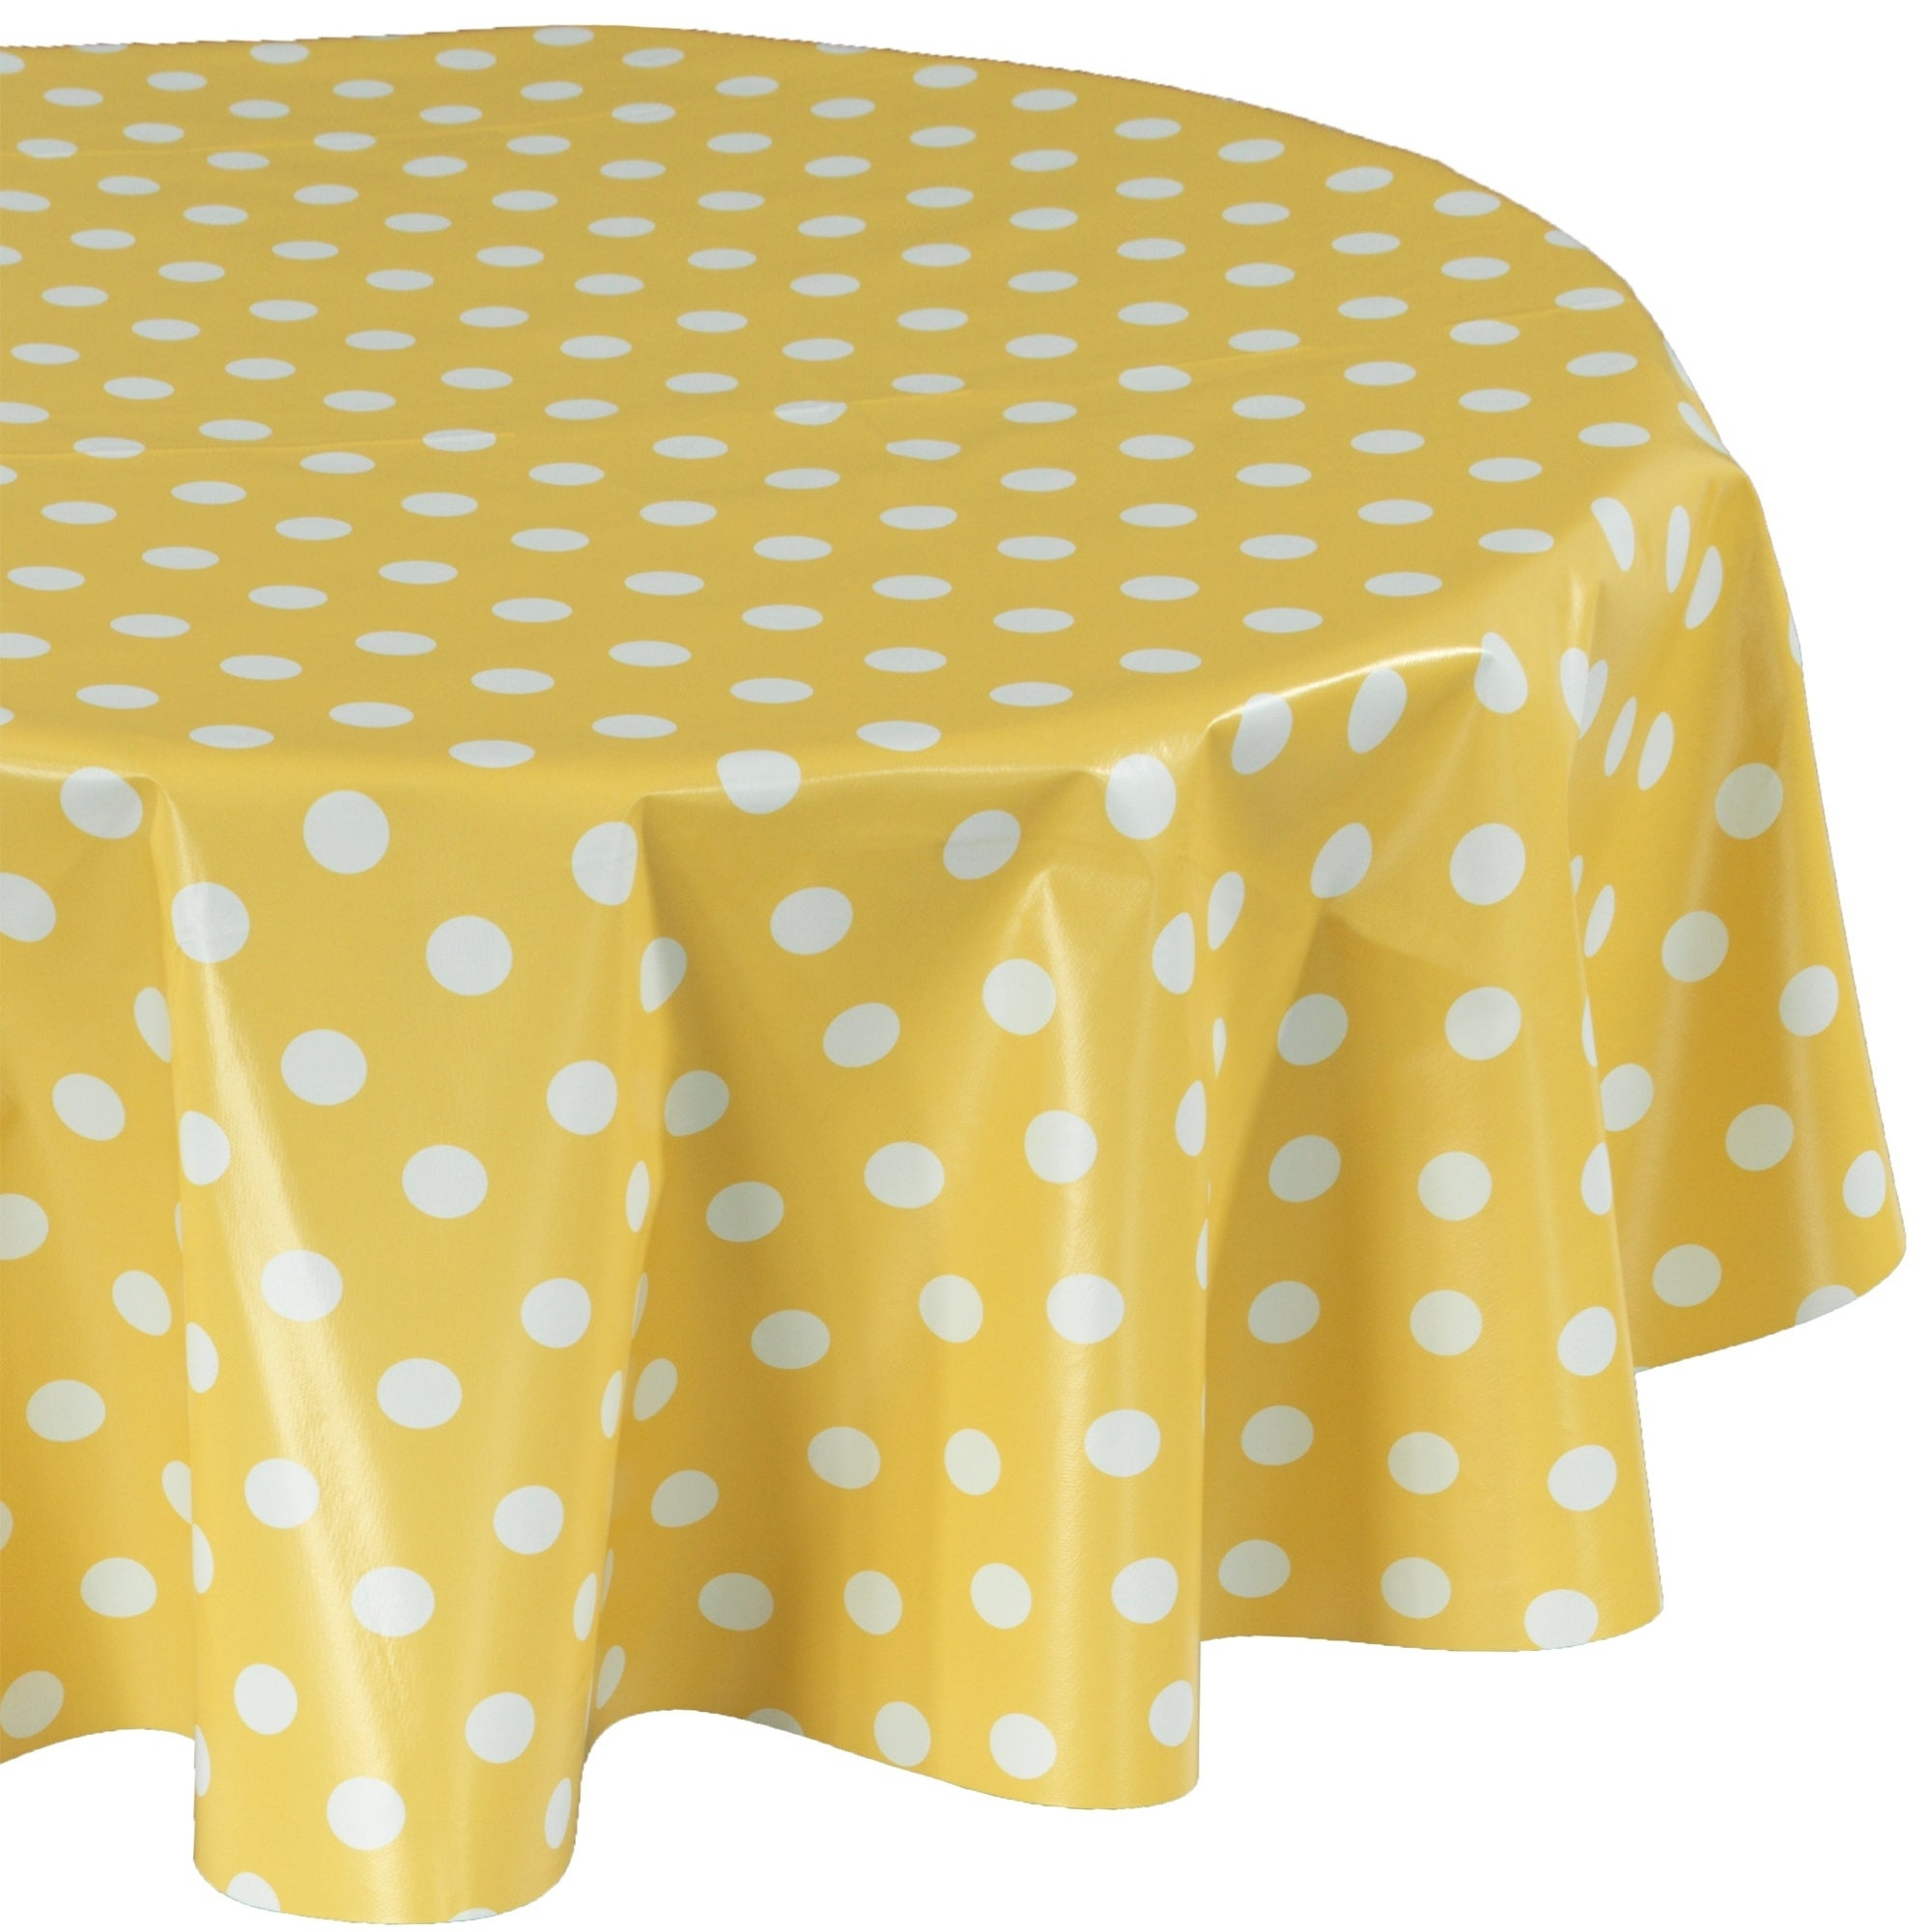 Berrnour Home Vinyl Polka Dots Design Indoor/Outdoor Tablecloth   eBay